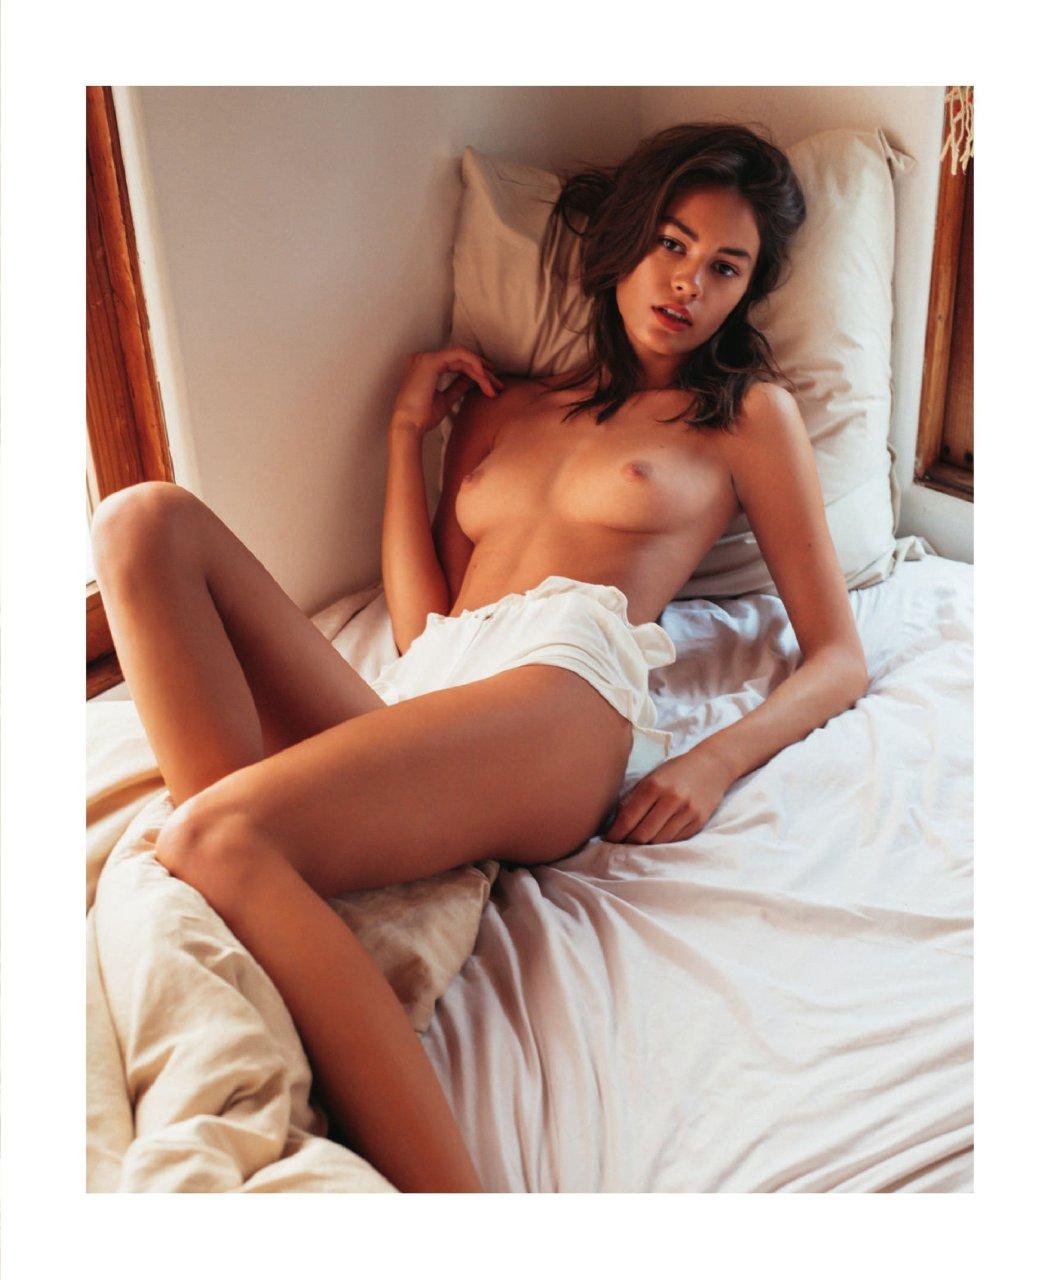 Beate muska topless 2 pics